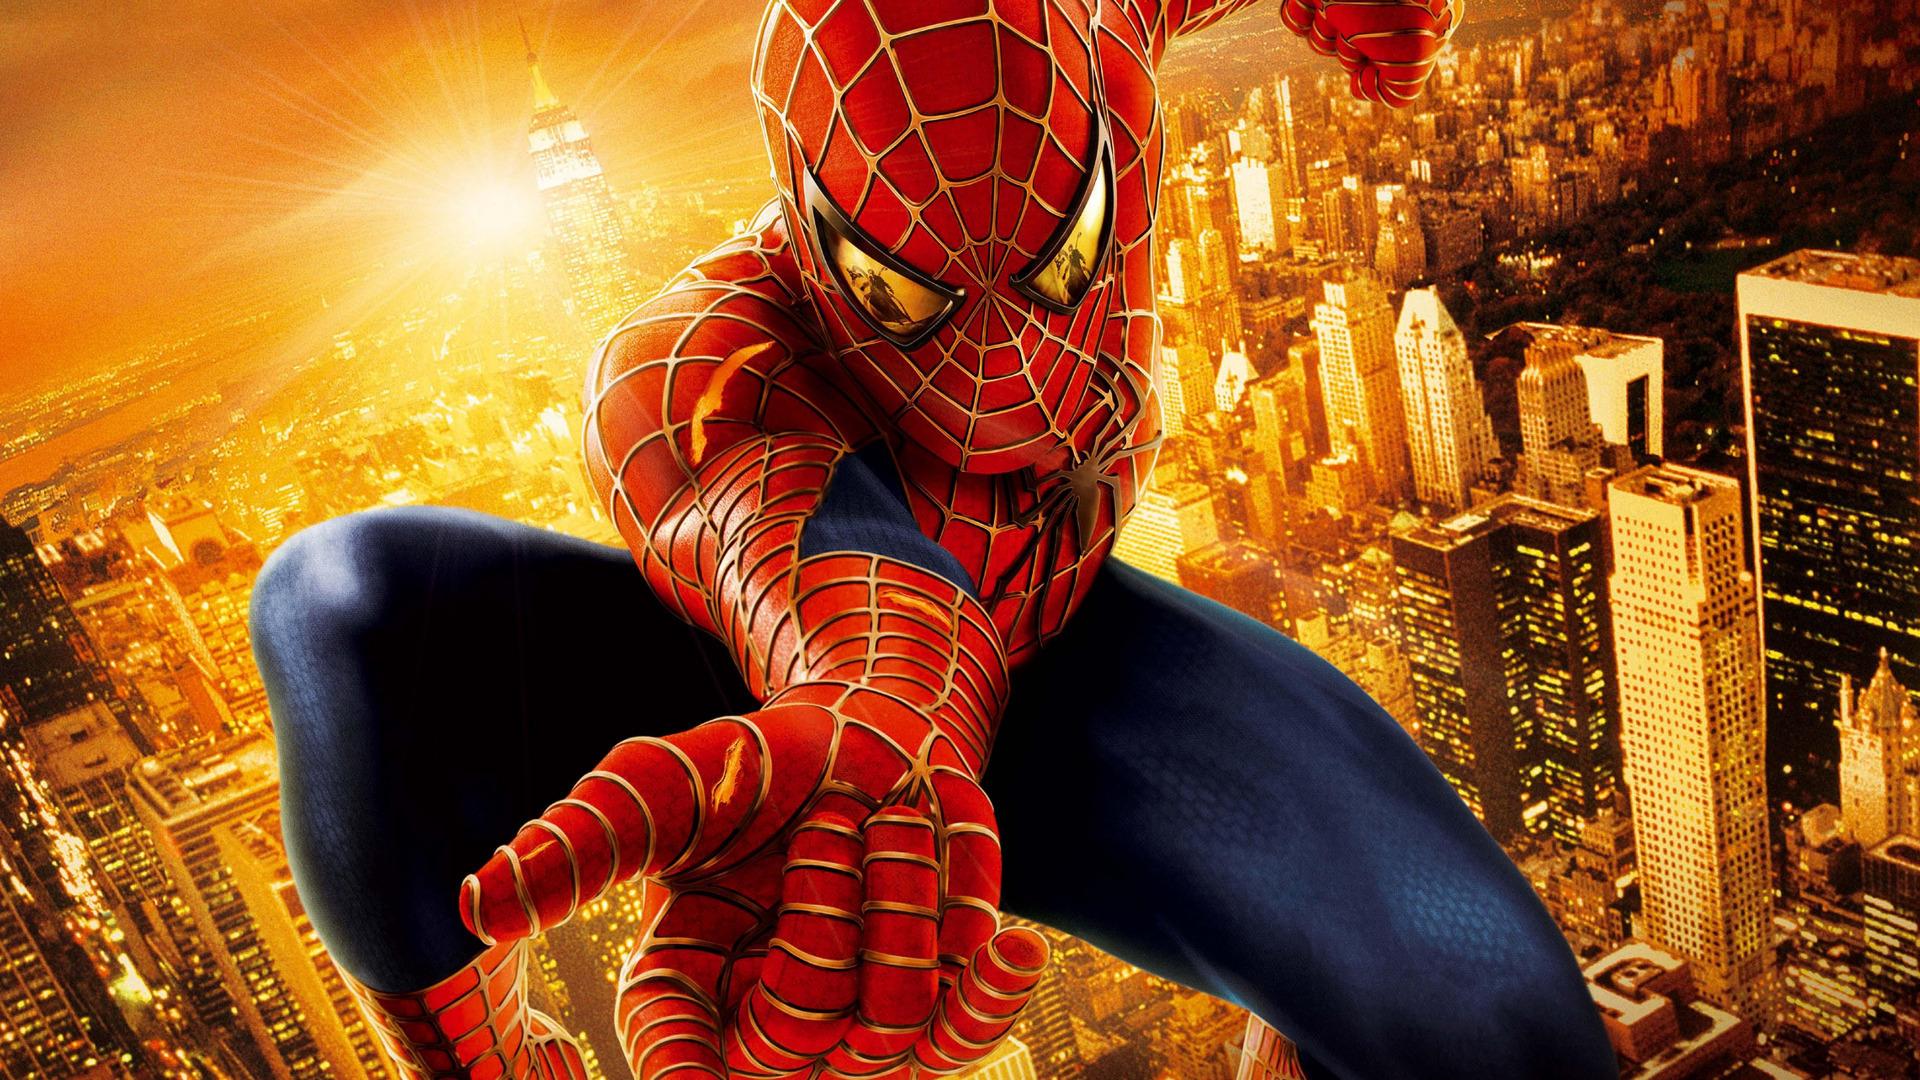 LaEscena_Spiderman